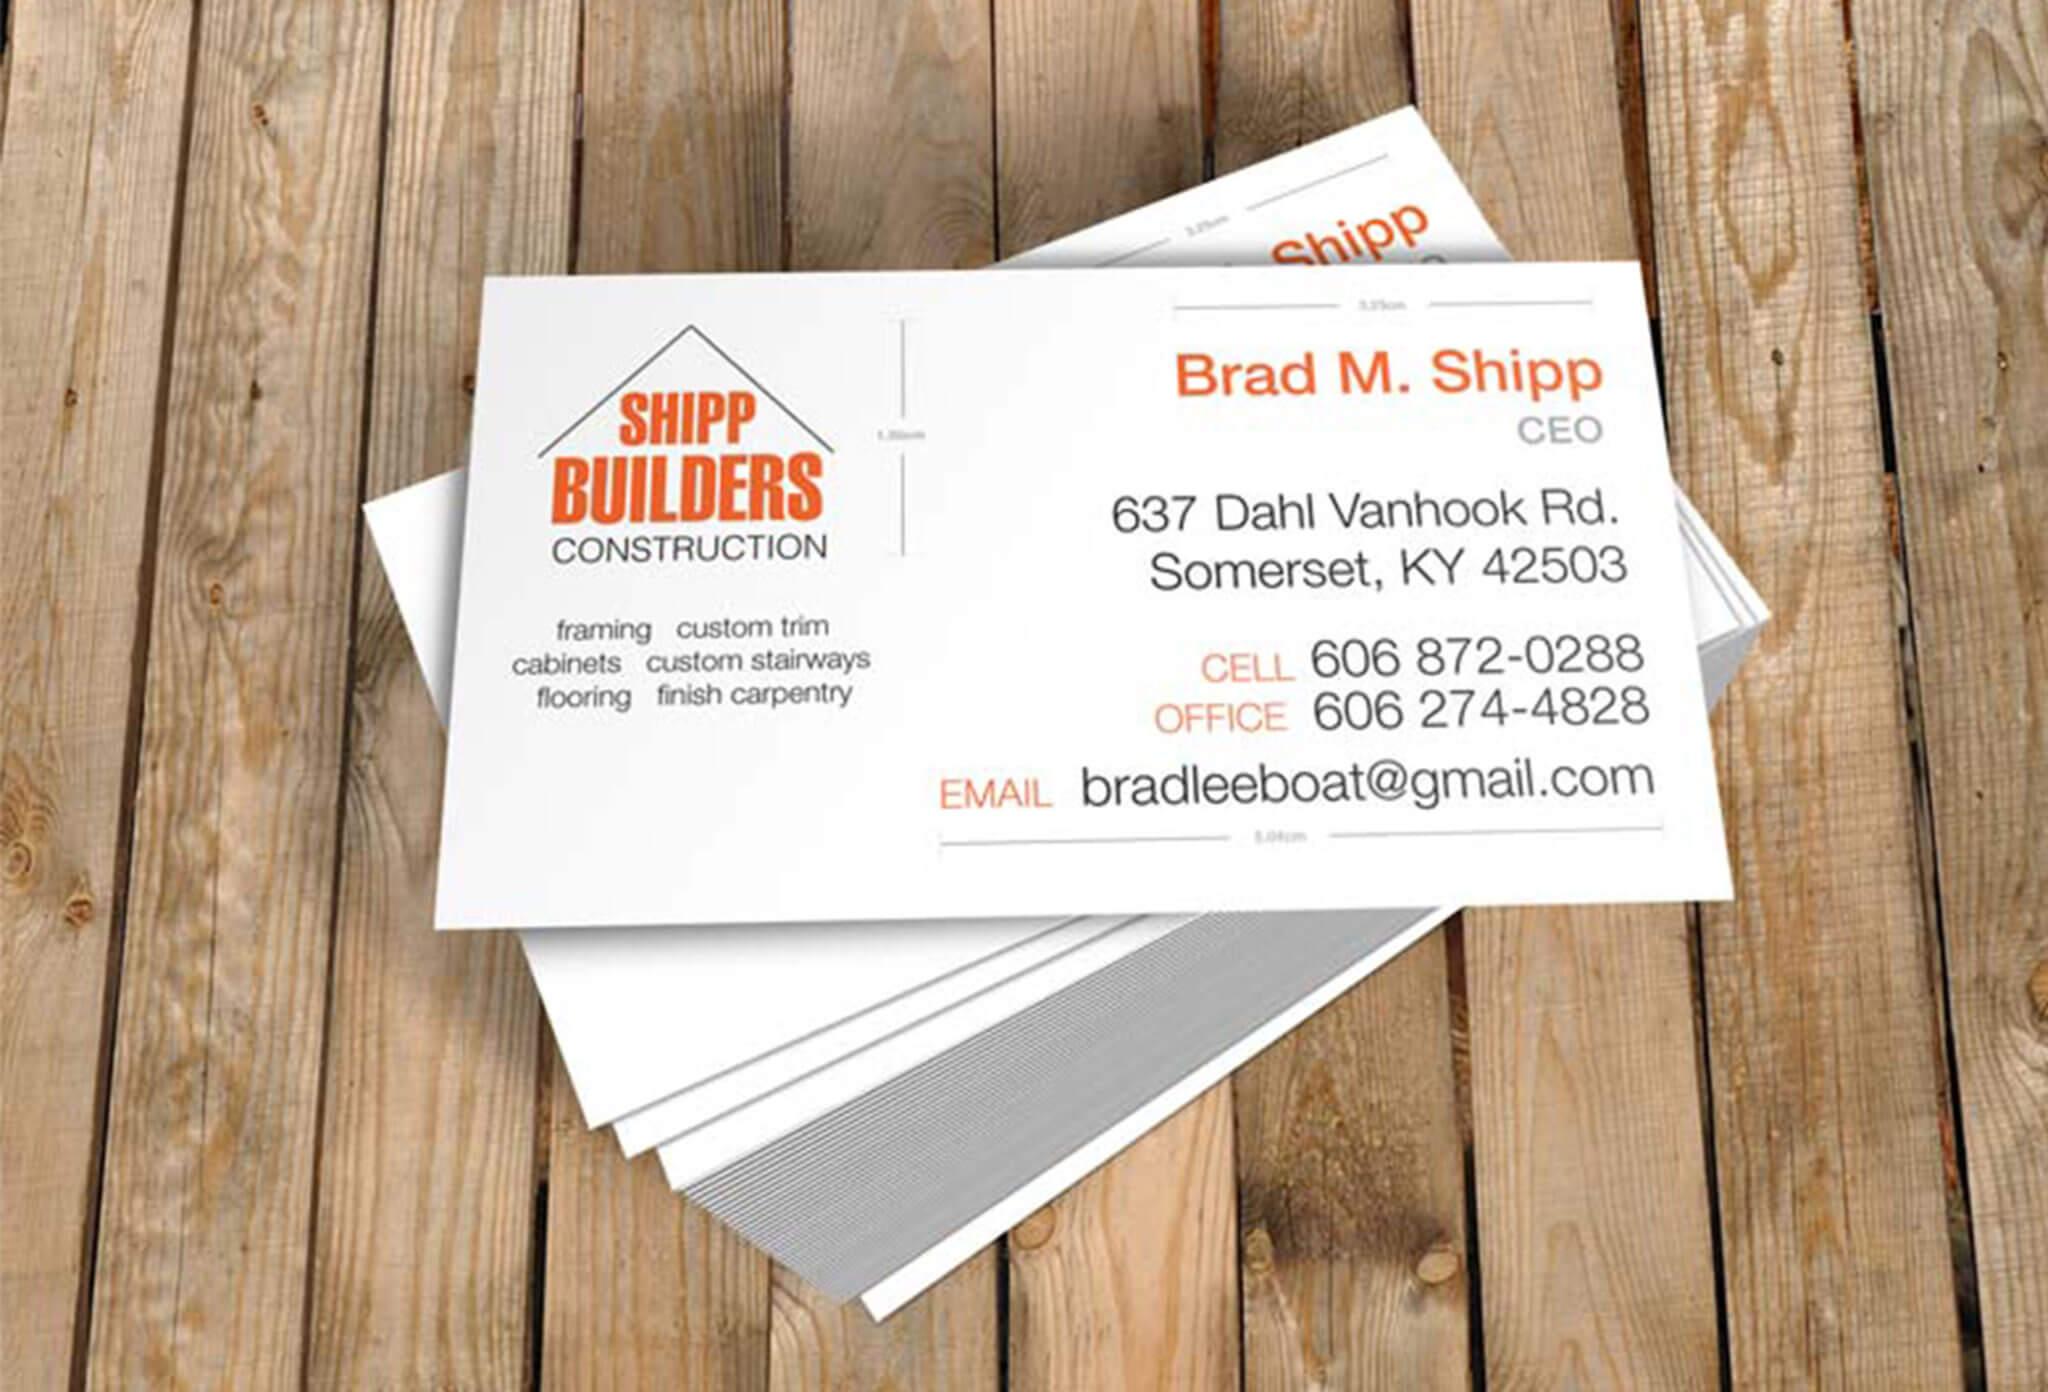 Bradd_Shipp_Business_Card_header